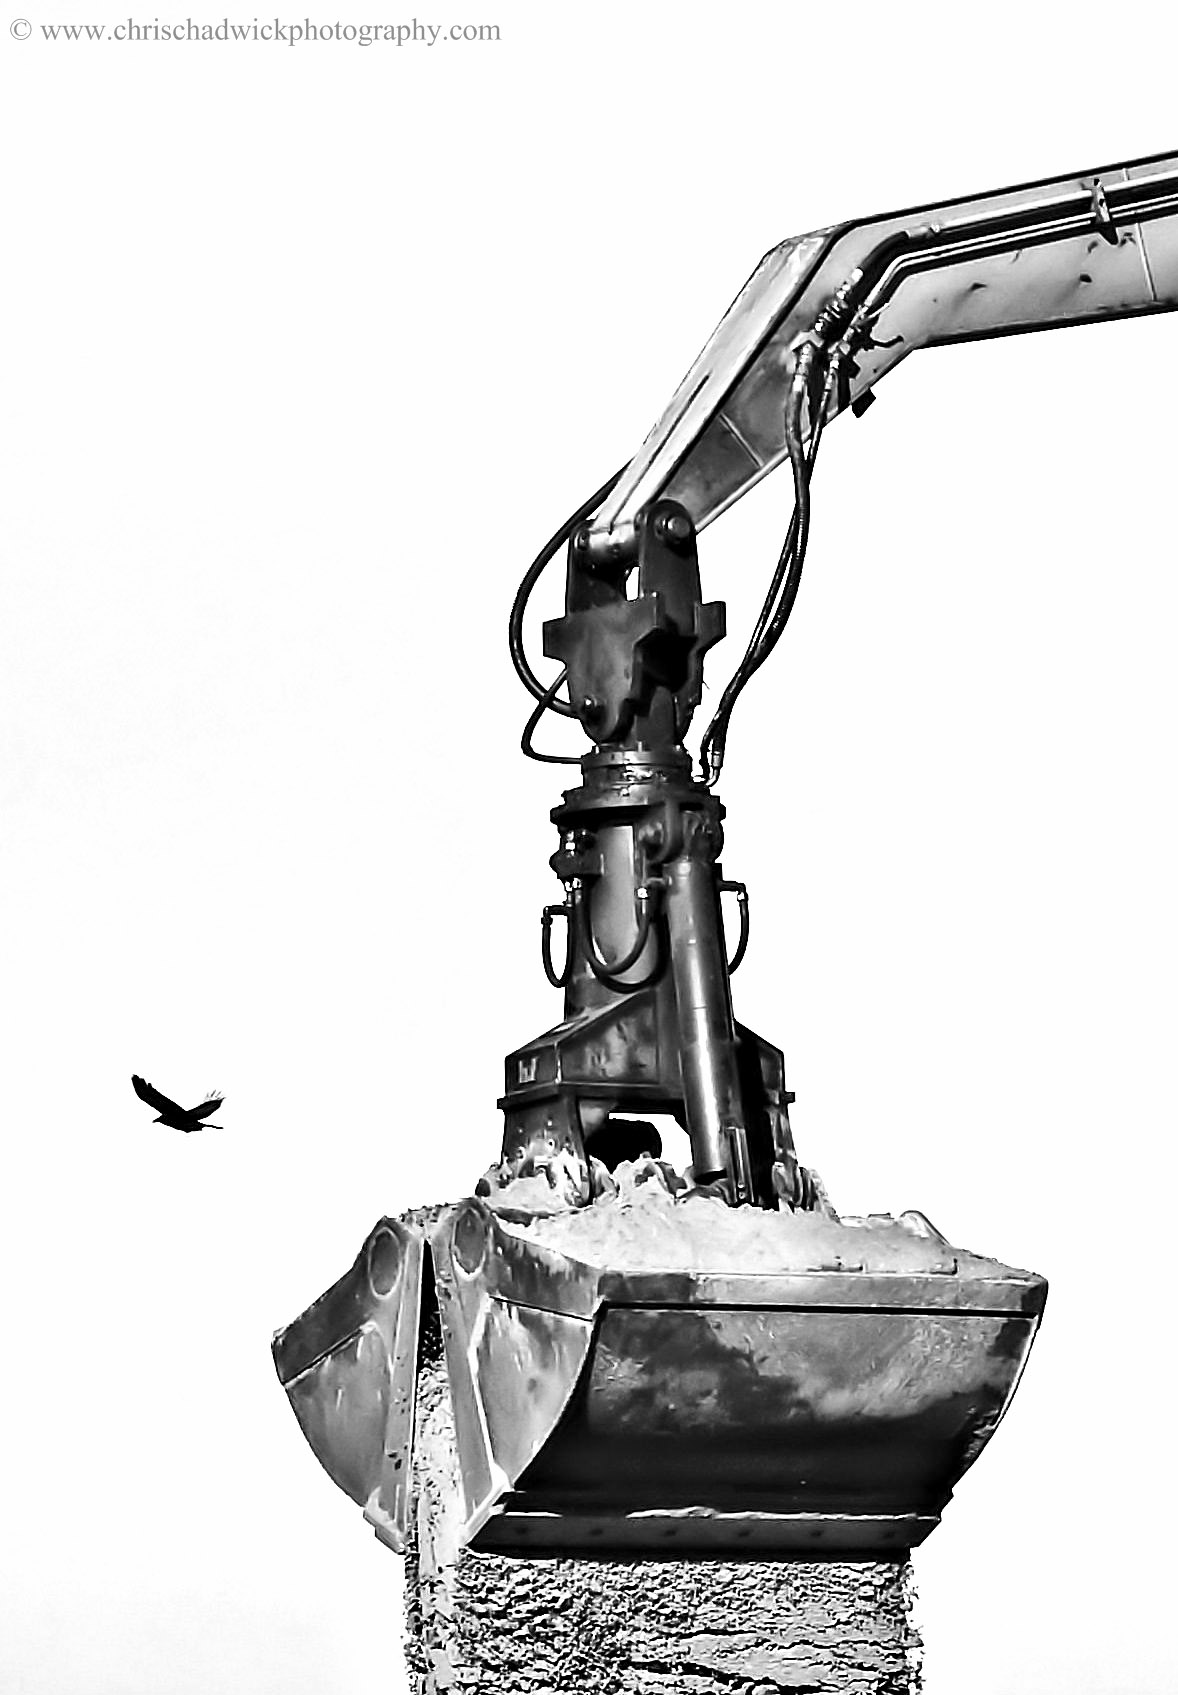 Crow and Crane